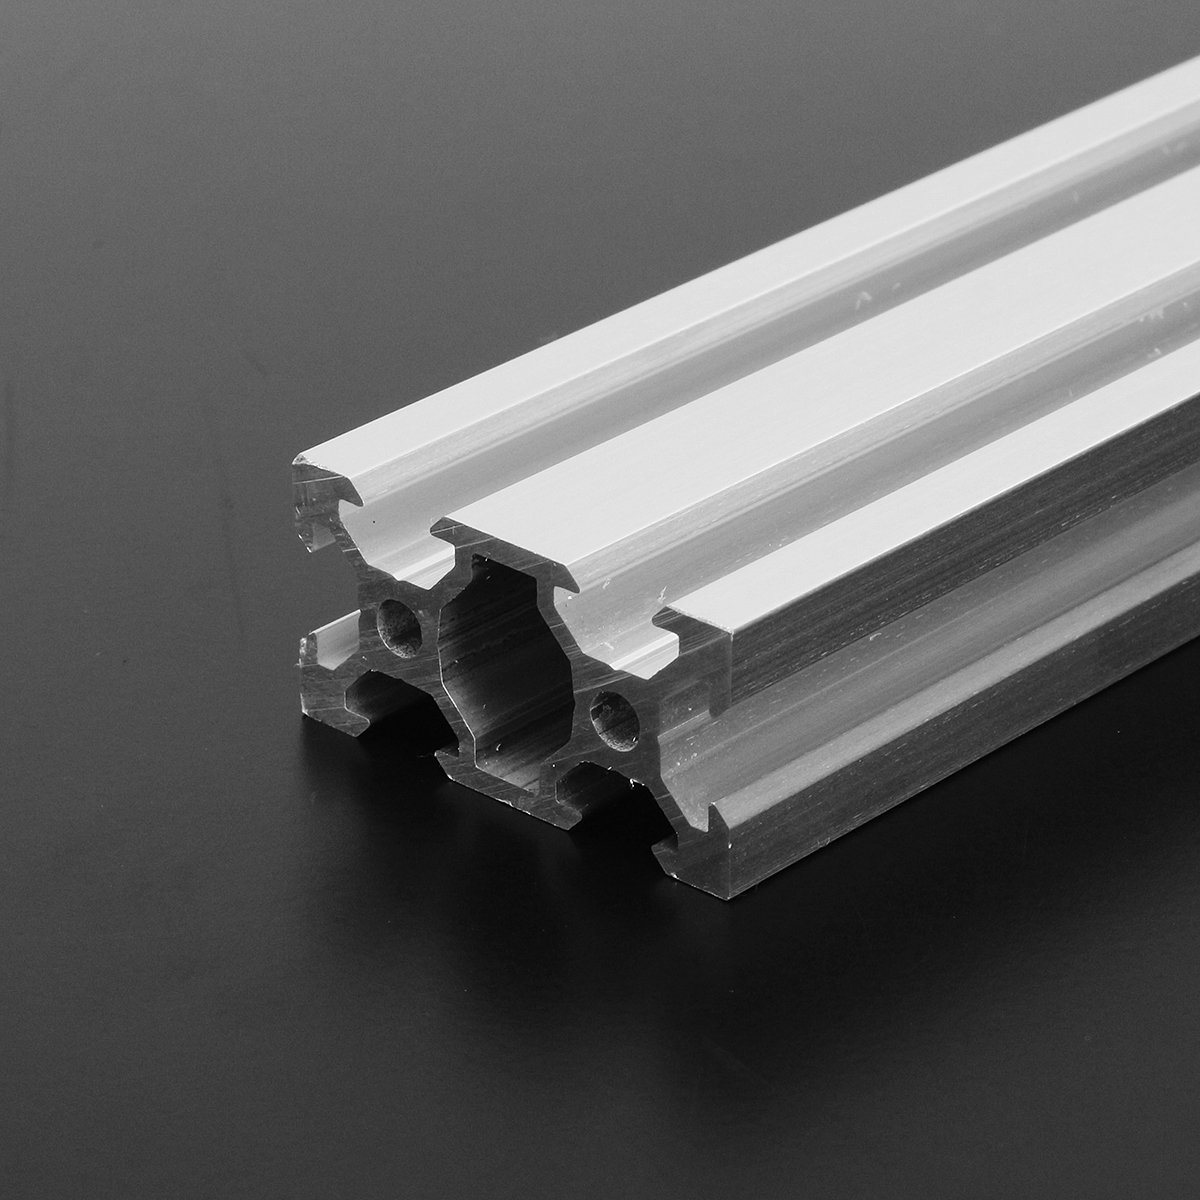 Farwind 500mm 2040 V-Slot Aluminum Profile Extrusion Frame DIY CNC Tool Sliver